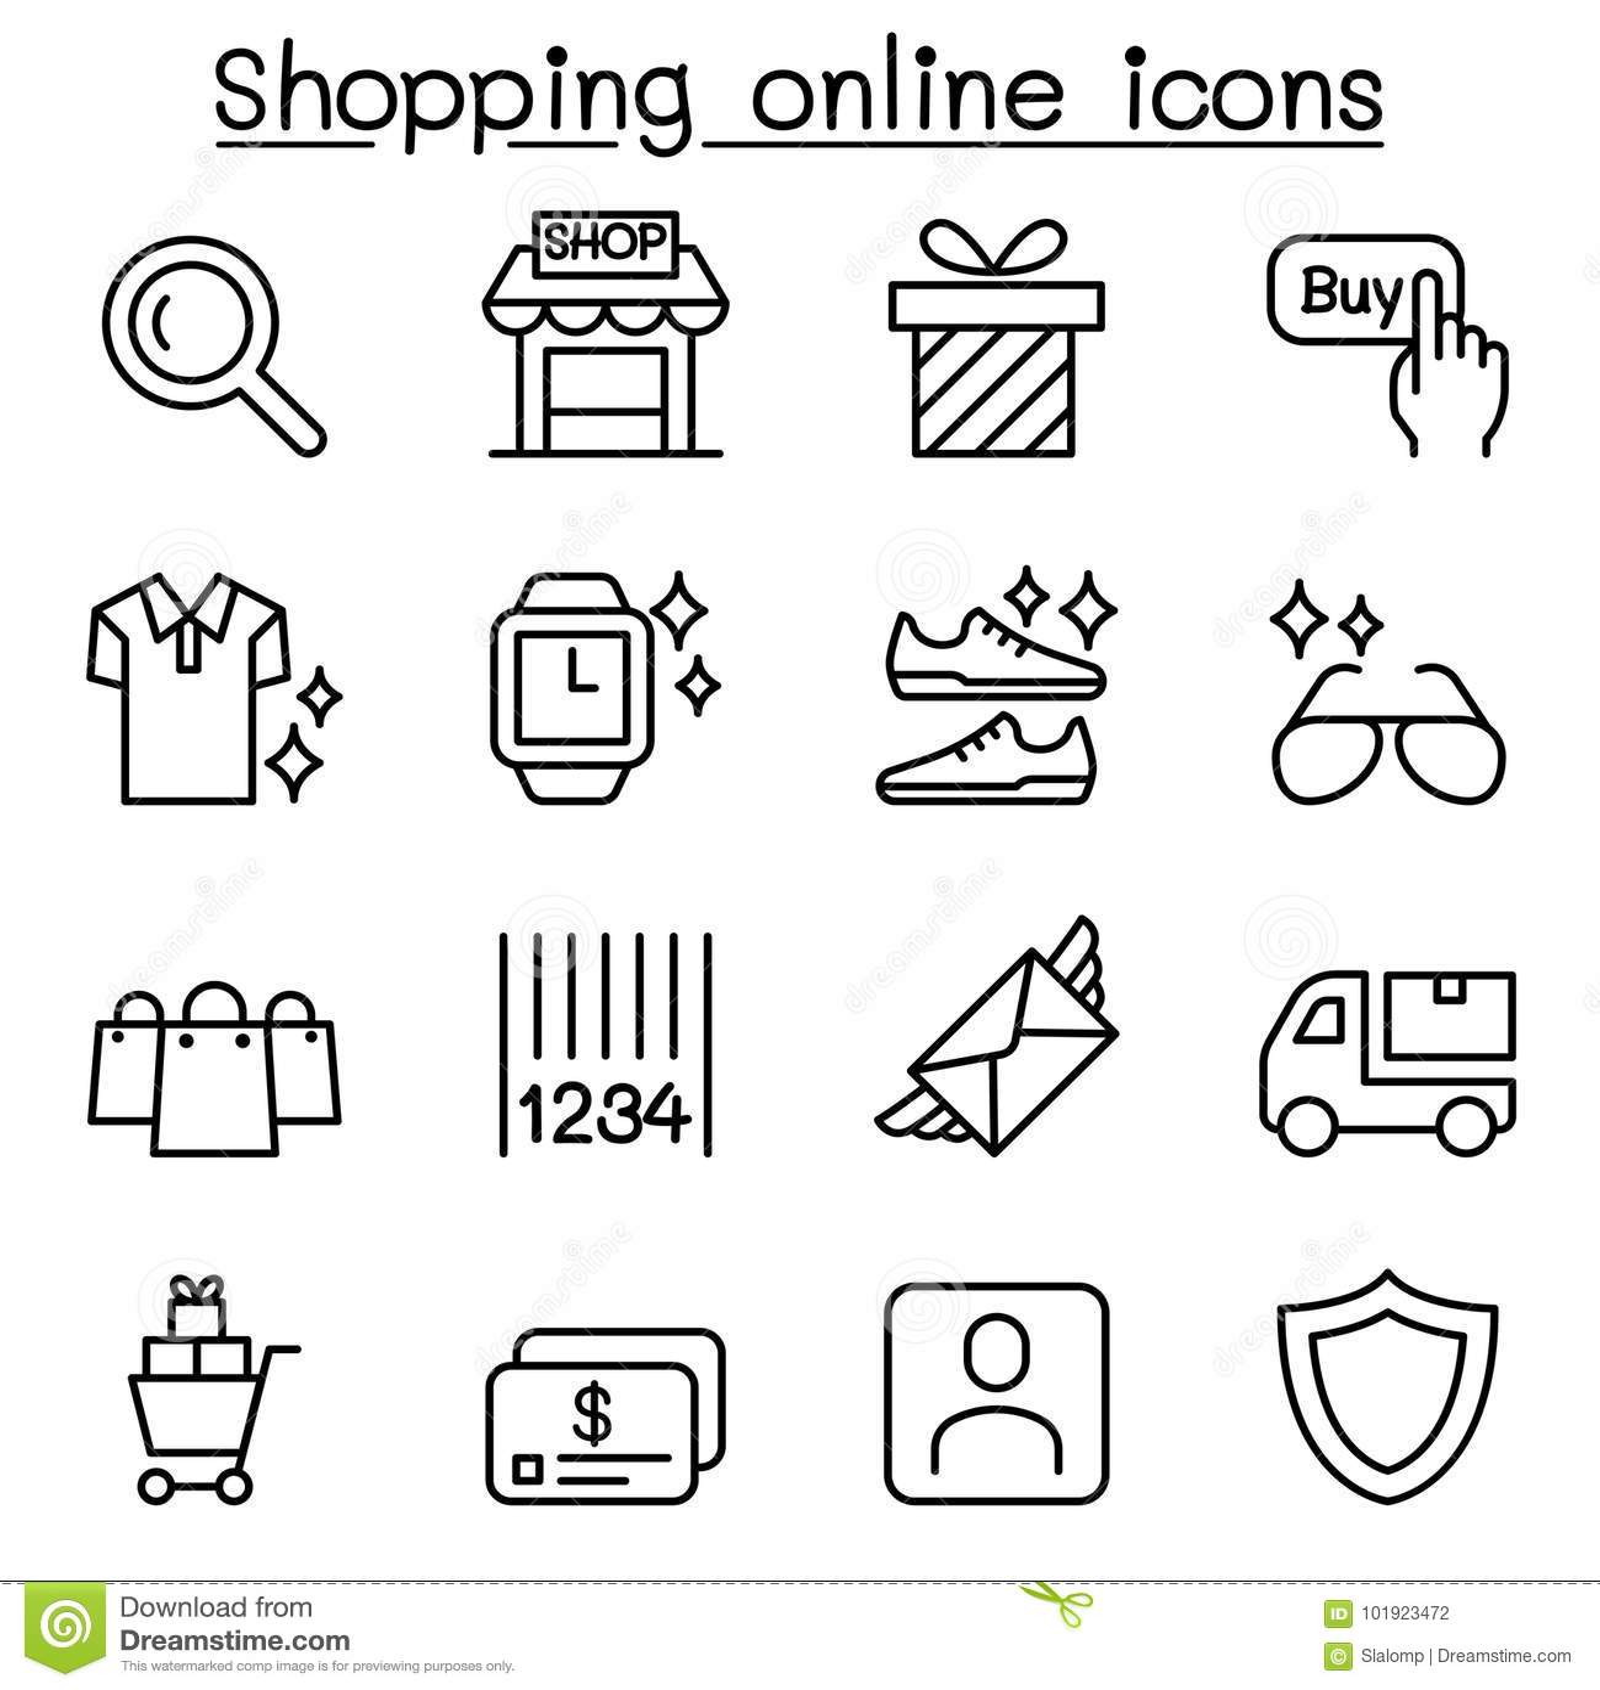 Ходя по магазинам онлайн значок установил в тонкую линию стиль